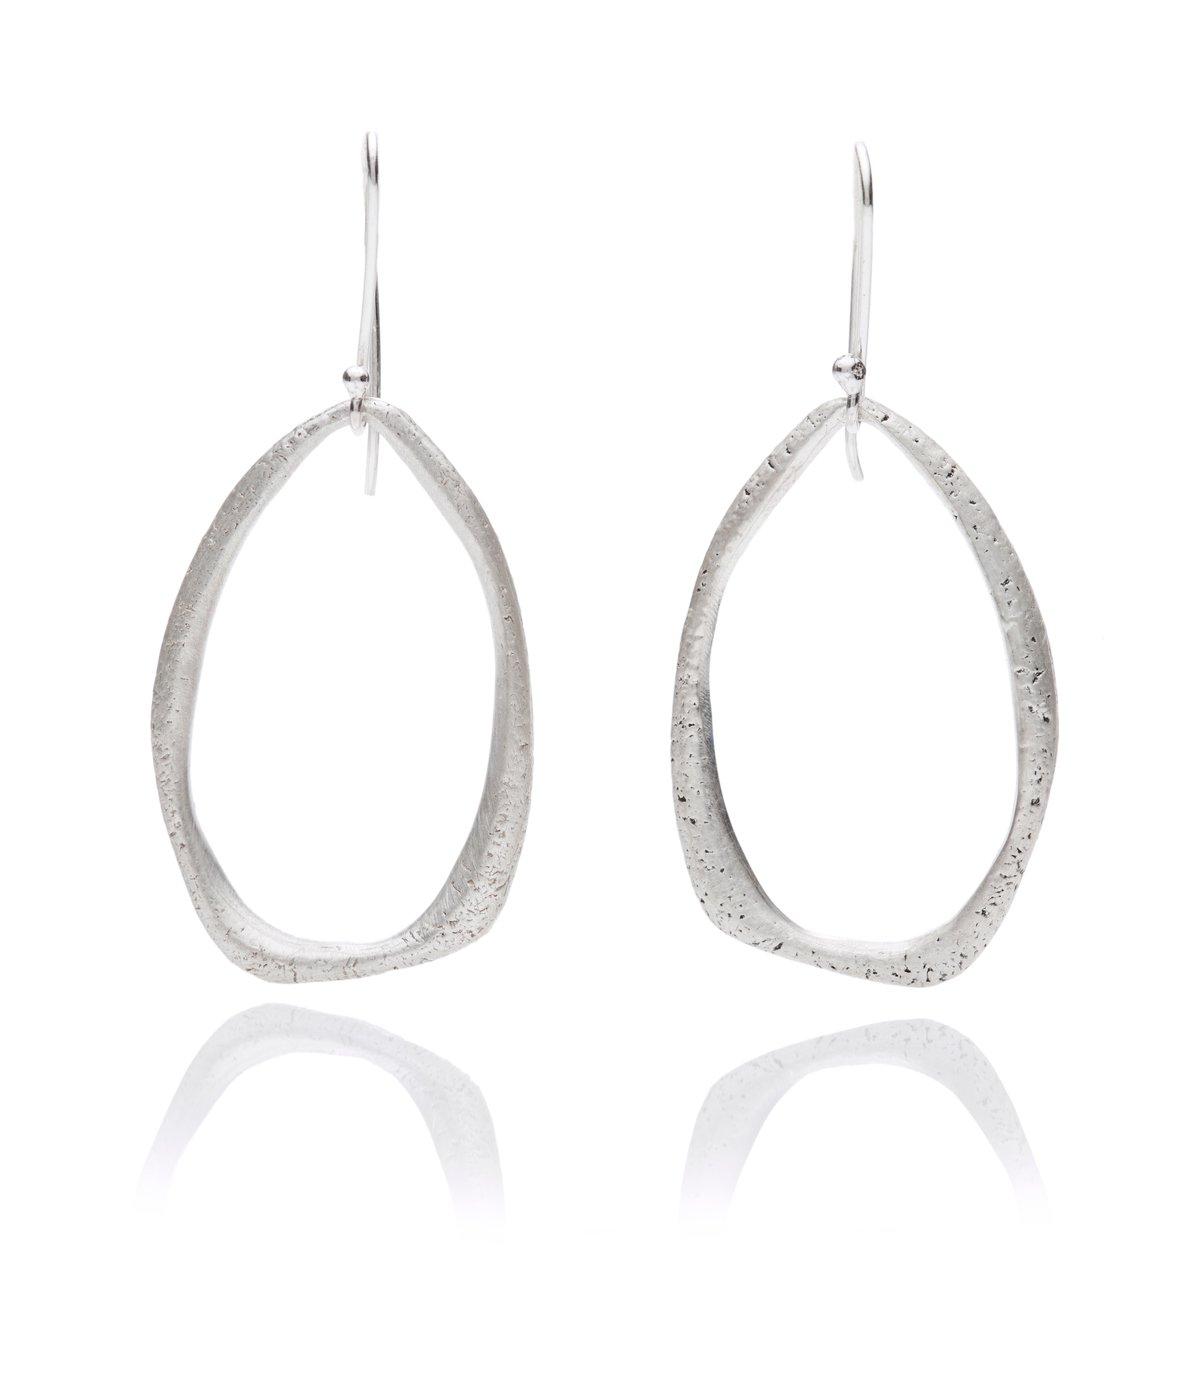 Texture teardrop hanging earrings in silver or 18k gold